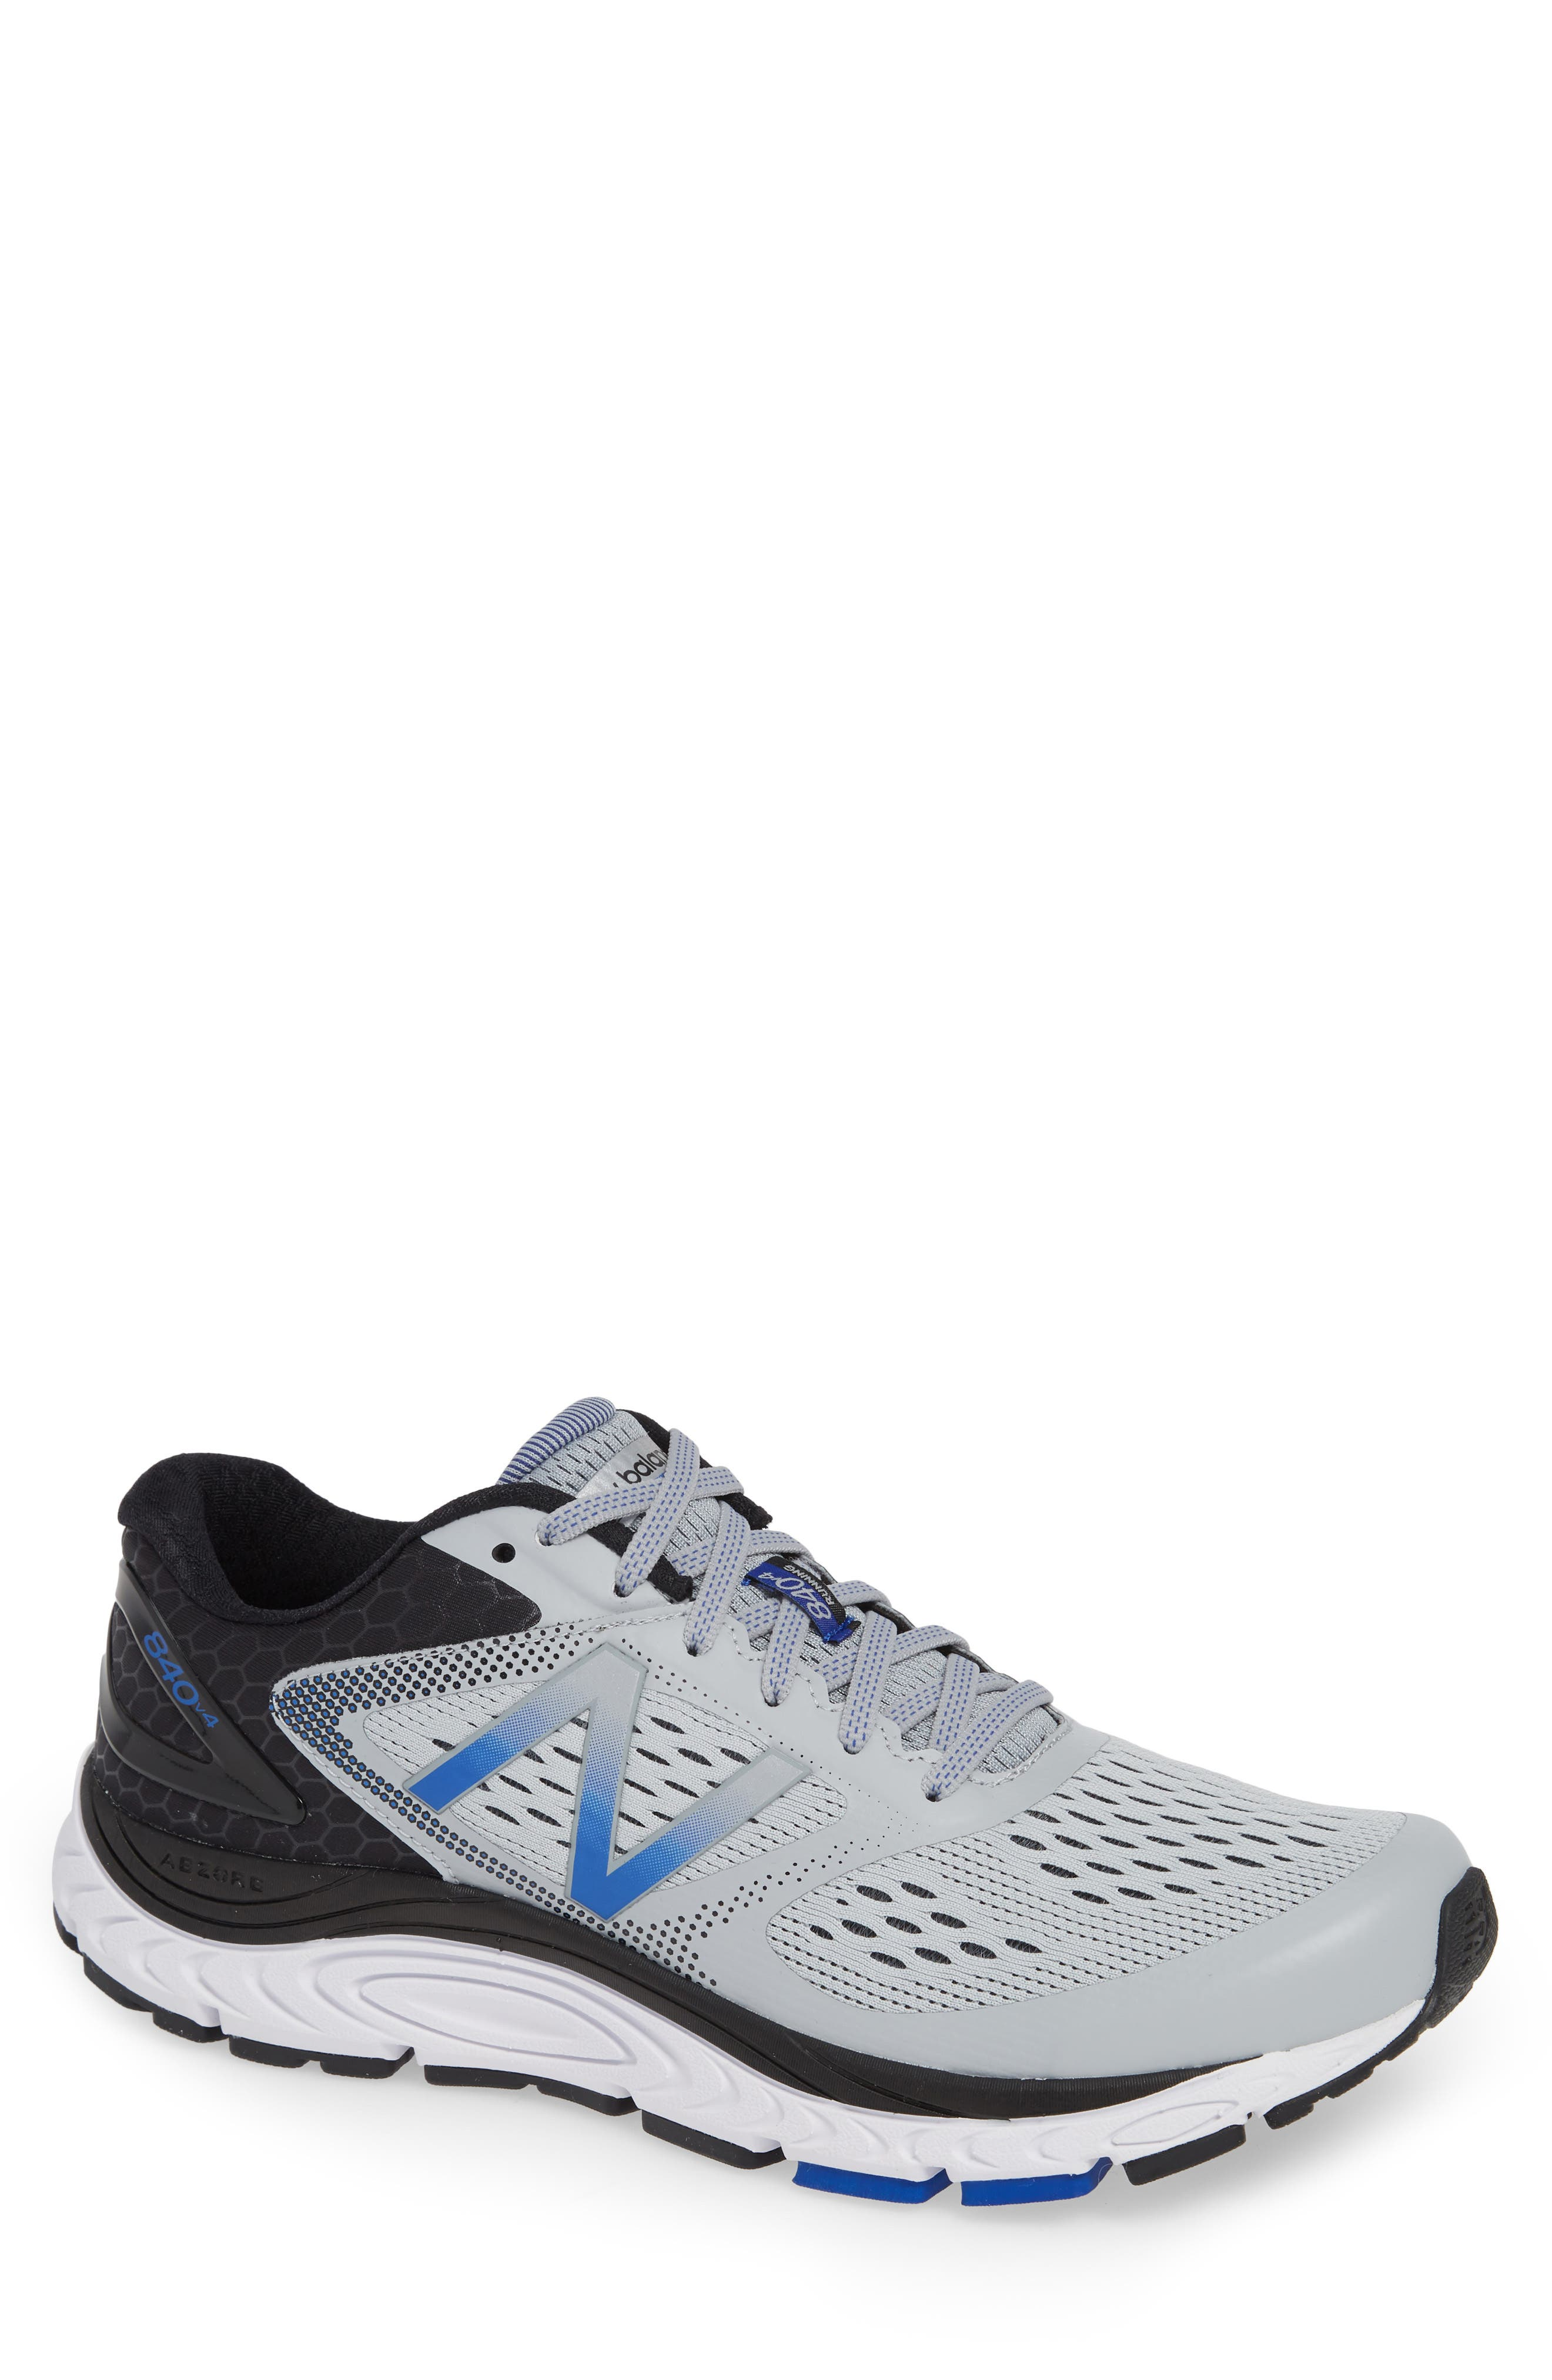 NEW BALANCE 840v4 Running Shoe, Main, color, 039